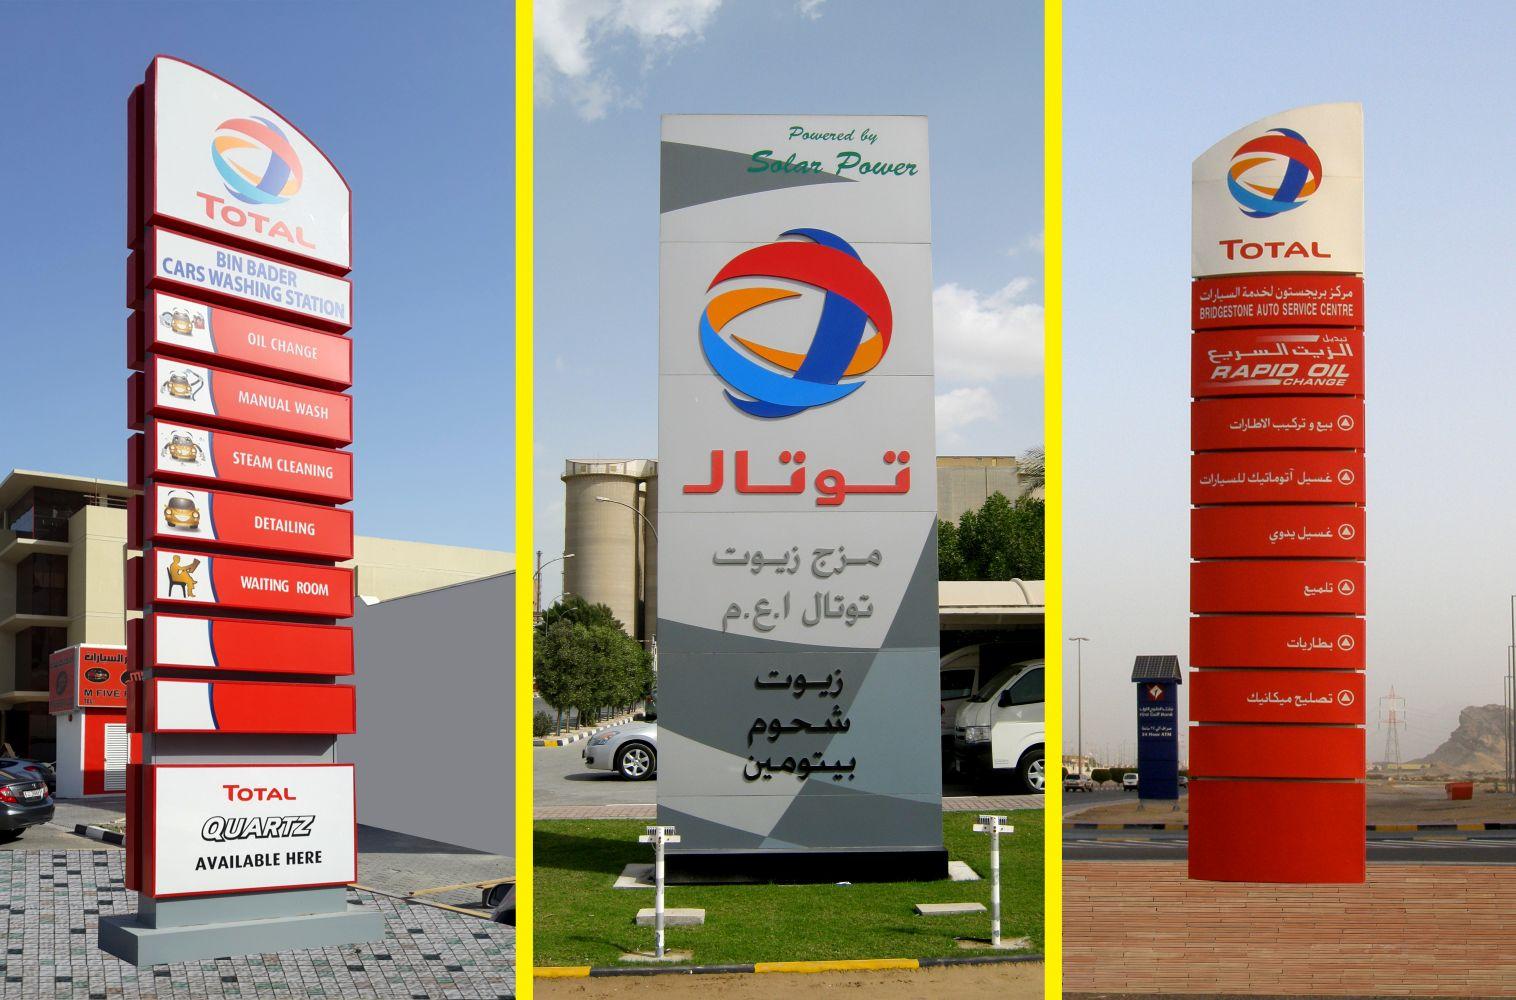 Khaleej Neon A Leading Sign And Graphics Company